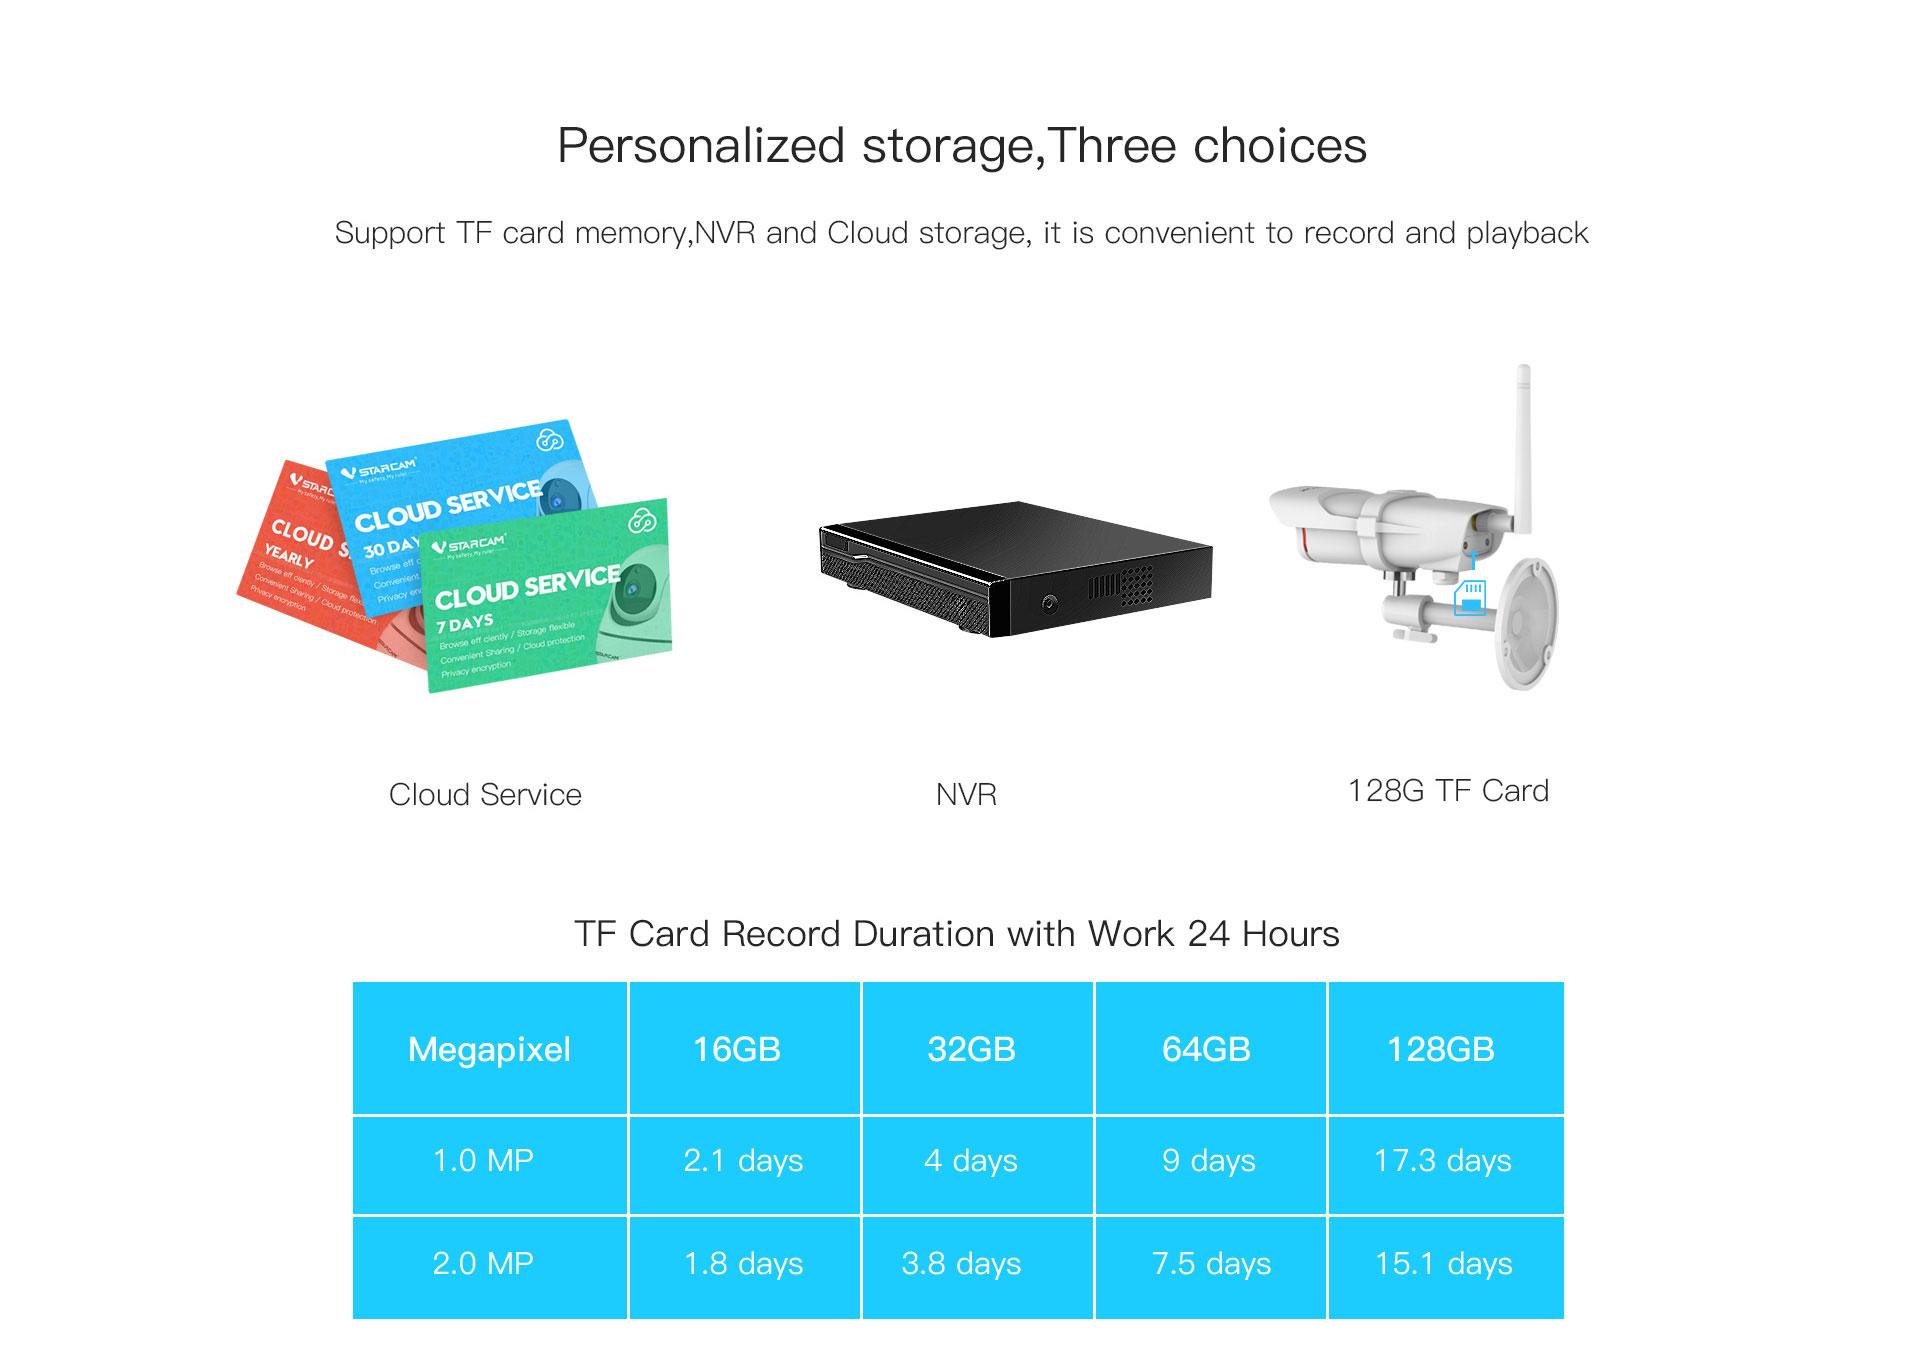 vstarcam cloud service